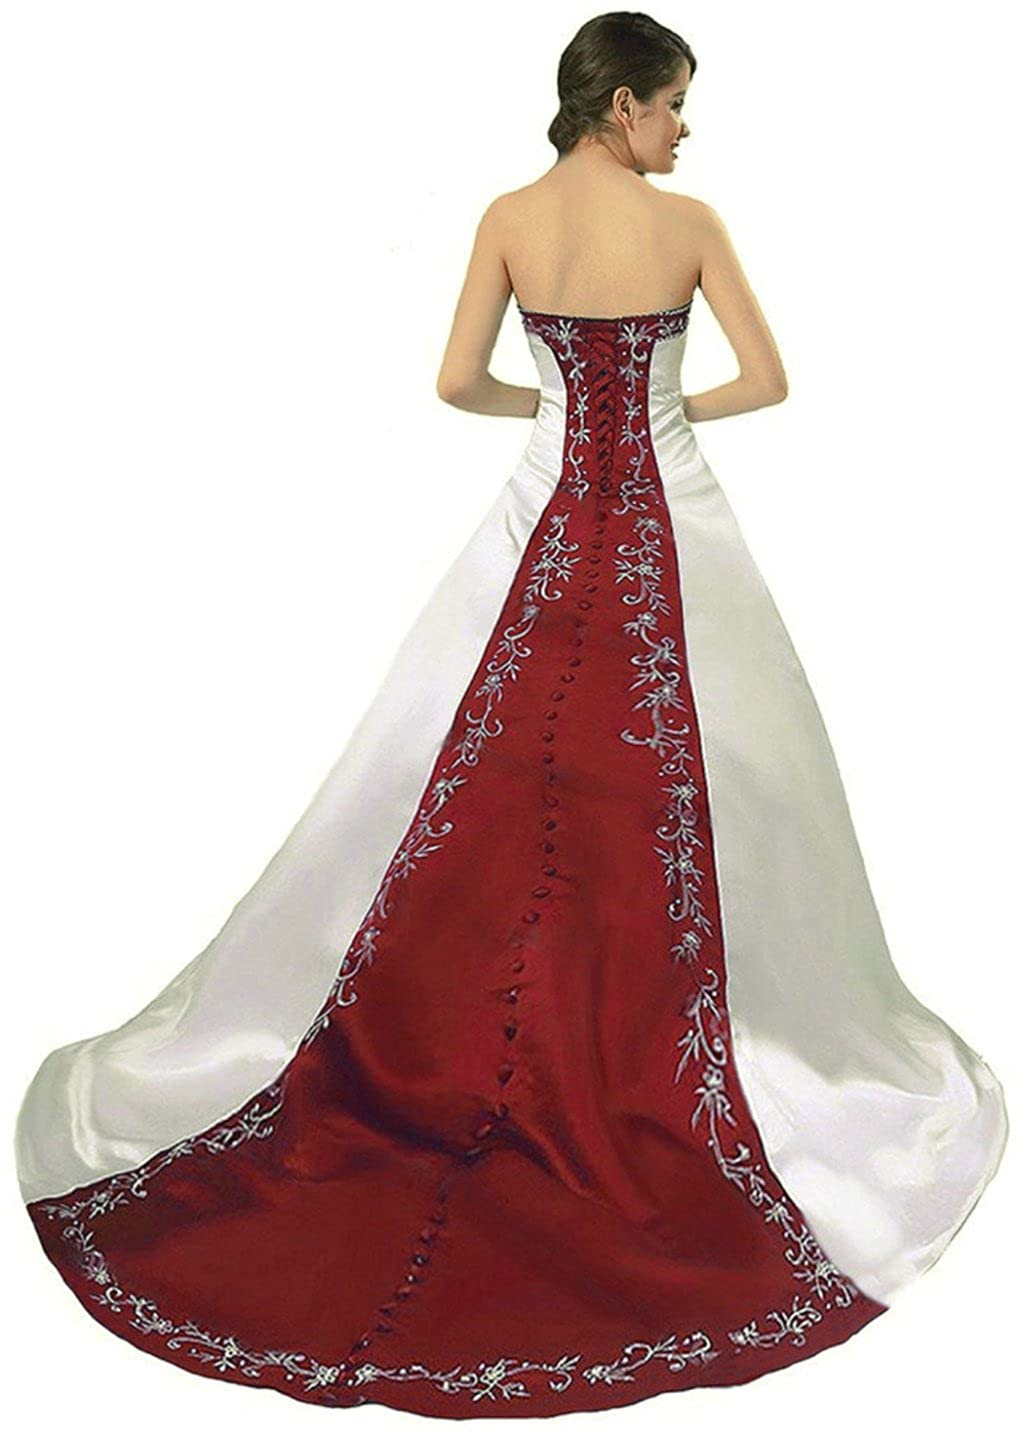 Ivory & Burgundy Vantexi Women's Strapless Satin Embroidery Wedding Dress Bridal Gown